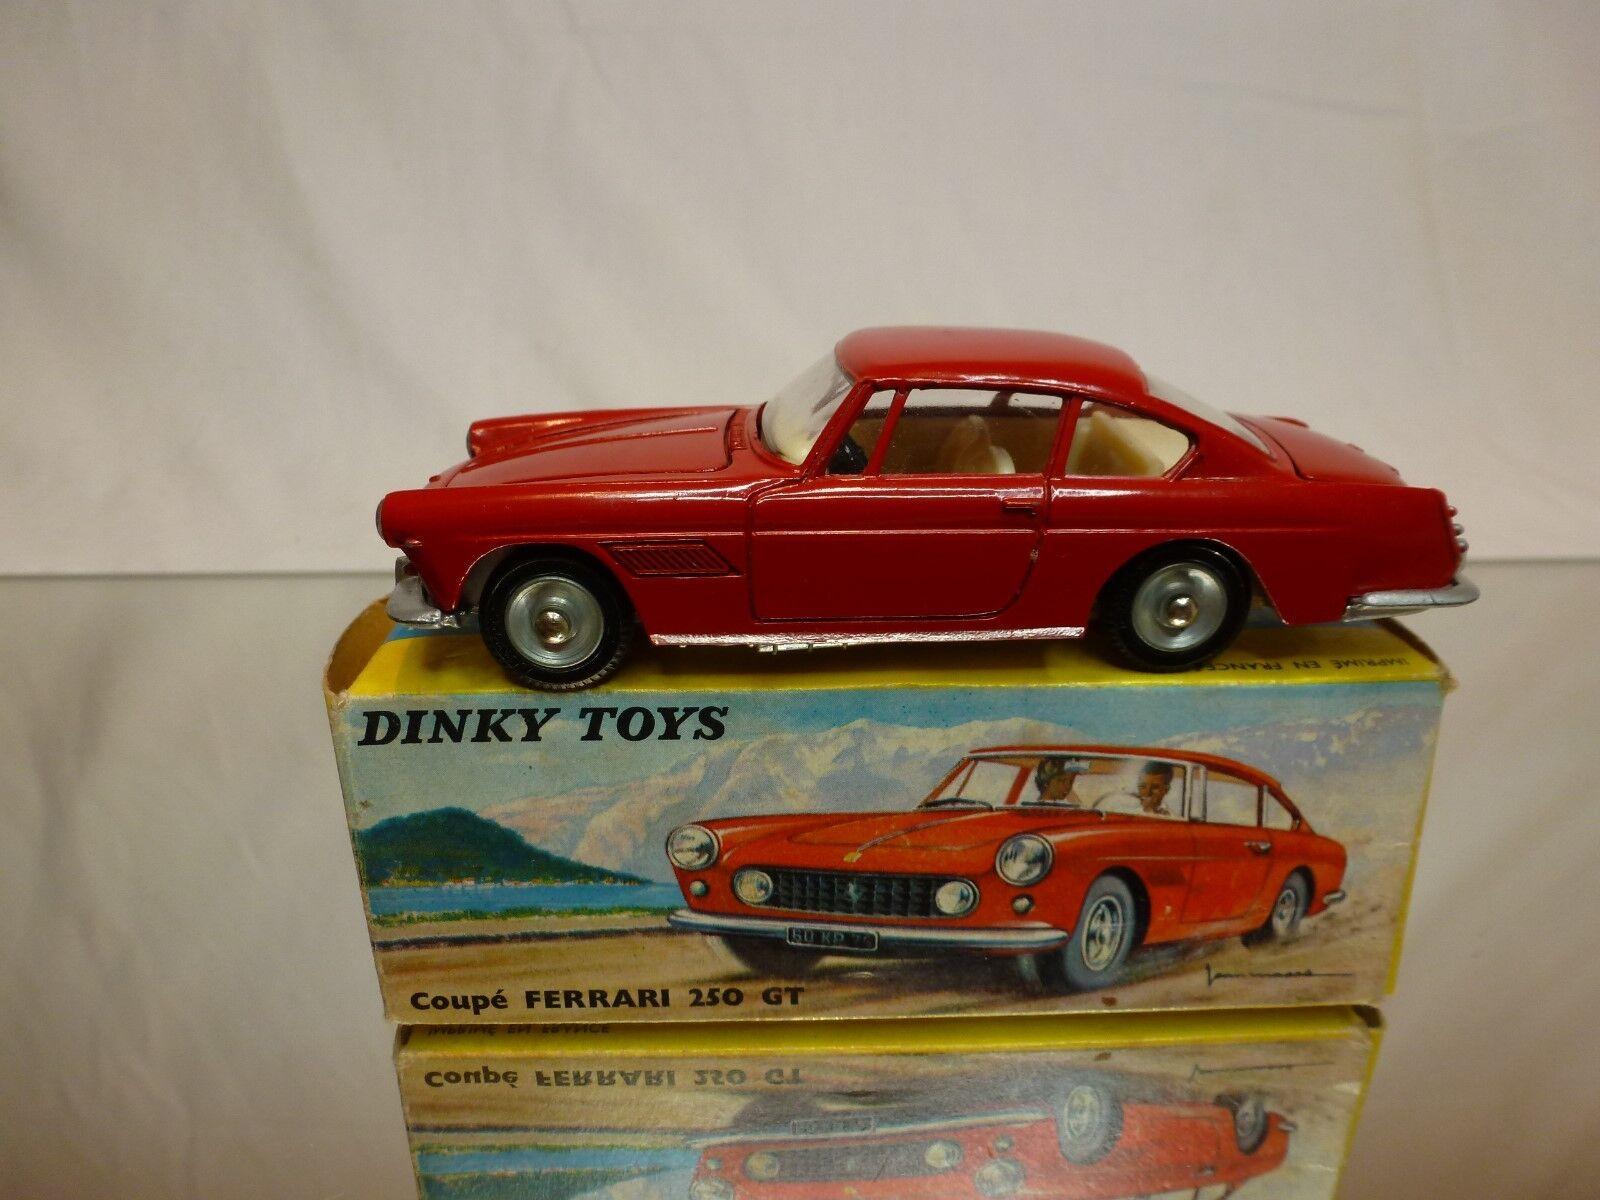 DINKY TOYS -  515 FERRARI 250 GT PININFARINA - VERY GOOD CONTITION  IN BOX